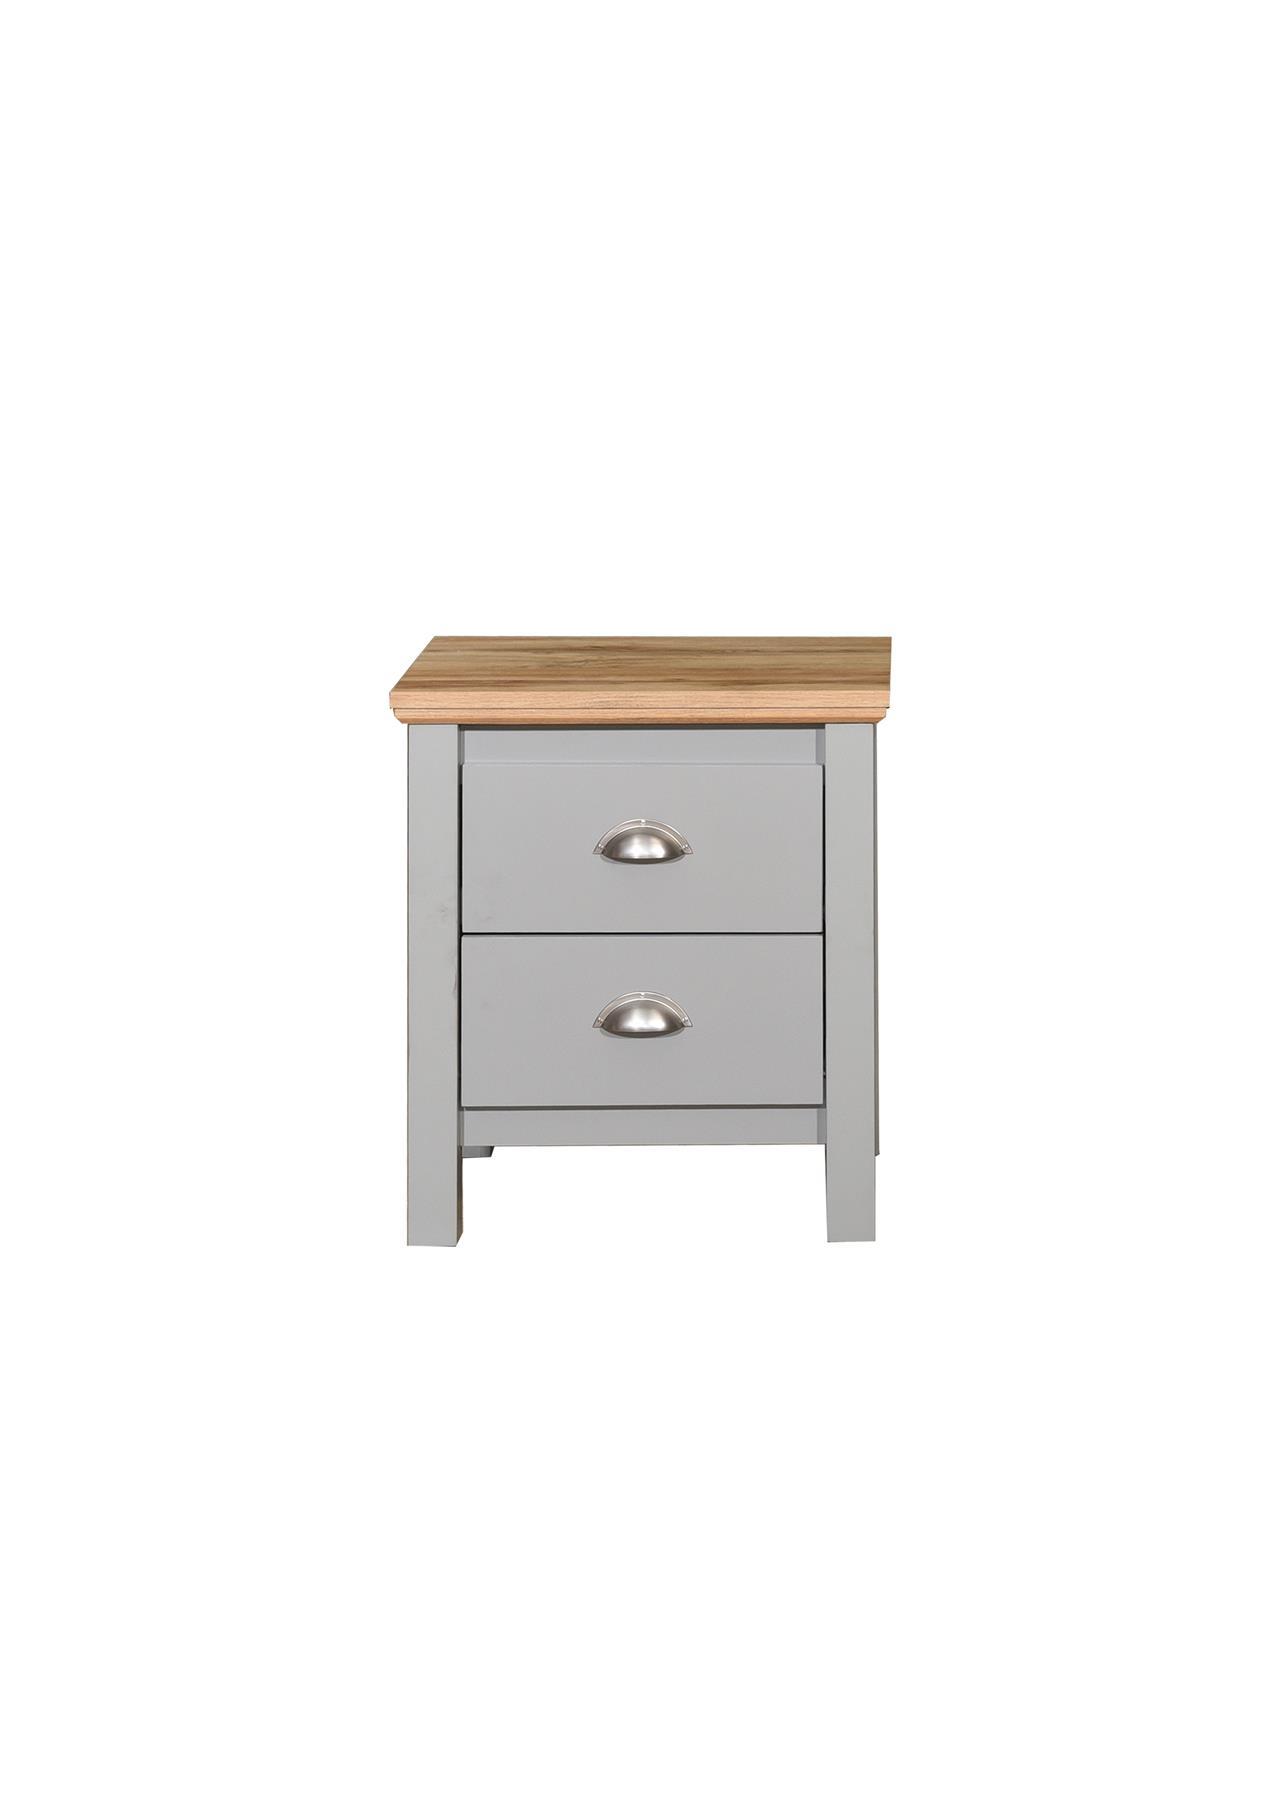 Stool Bedside Table: Eaton Grey Bedroom Furniture Bedside Wardrobe Chest